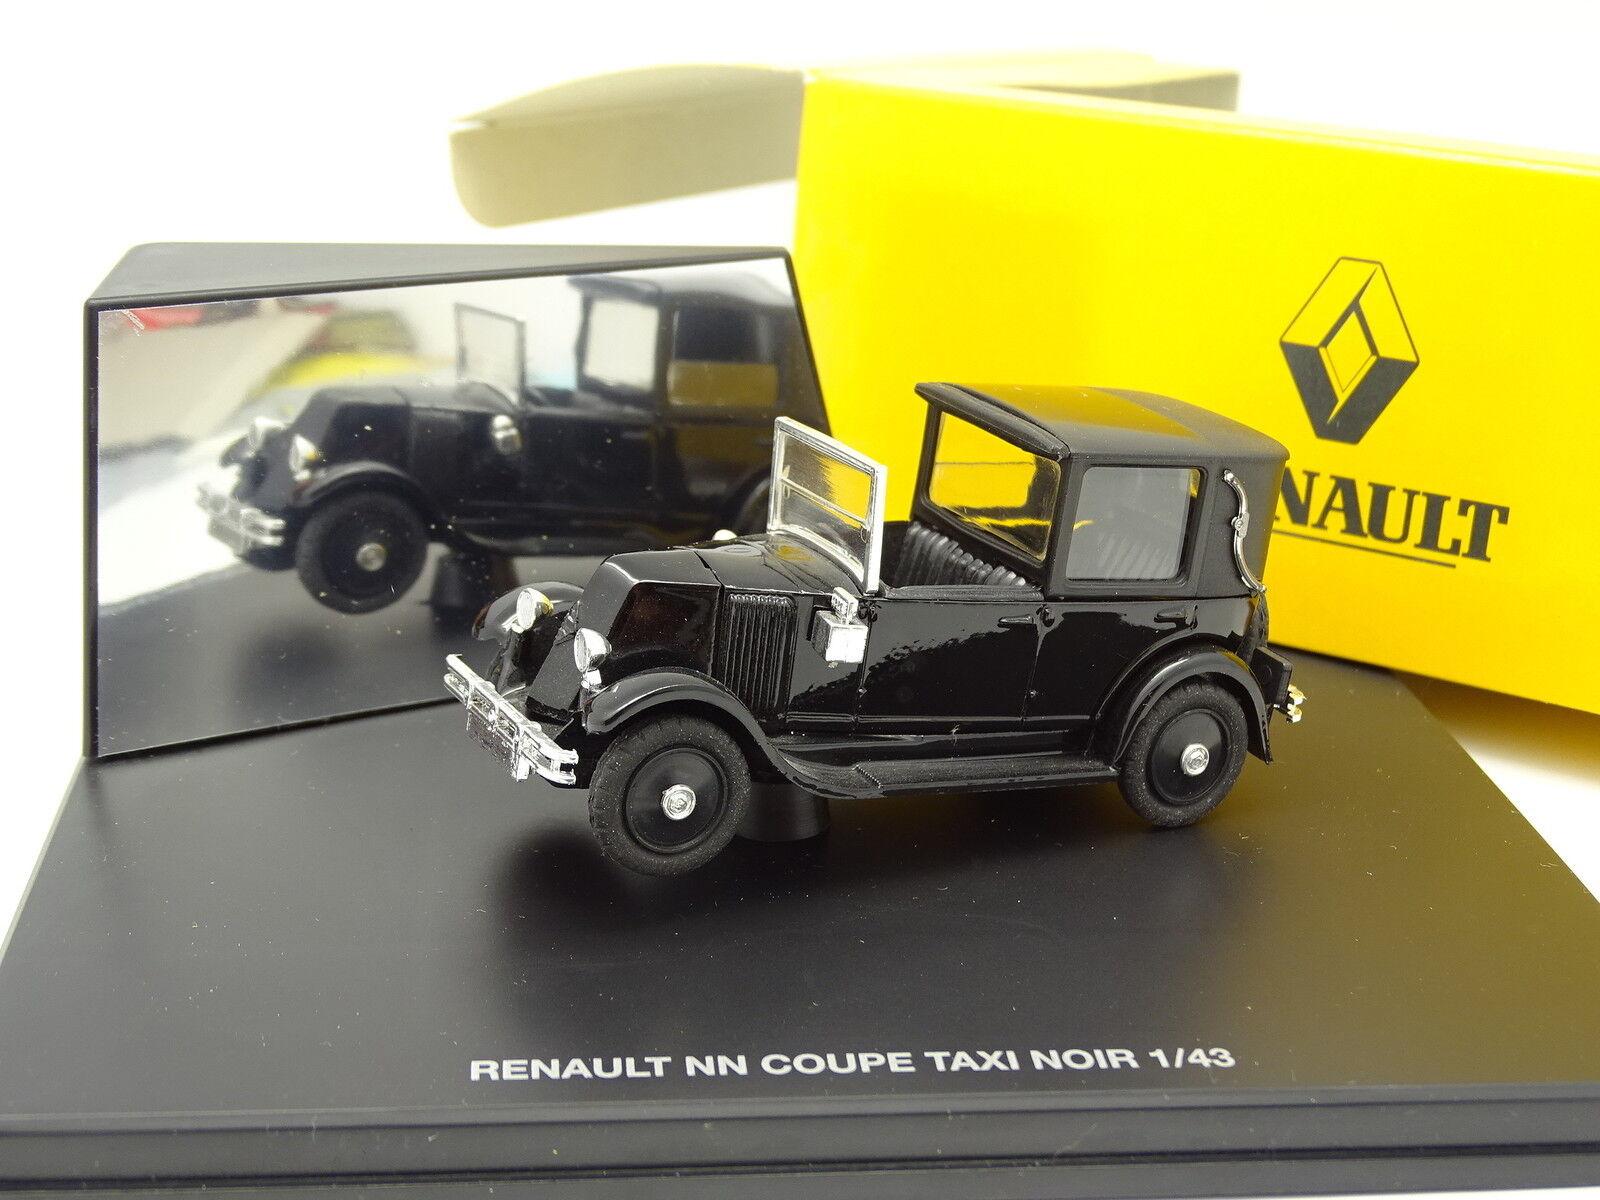 Eligor 1 43 - Renault NN Coupé Taxi Noir